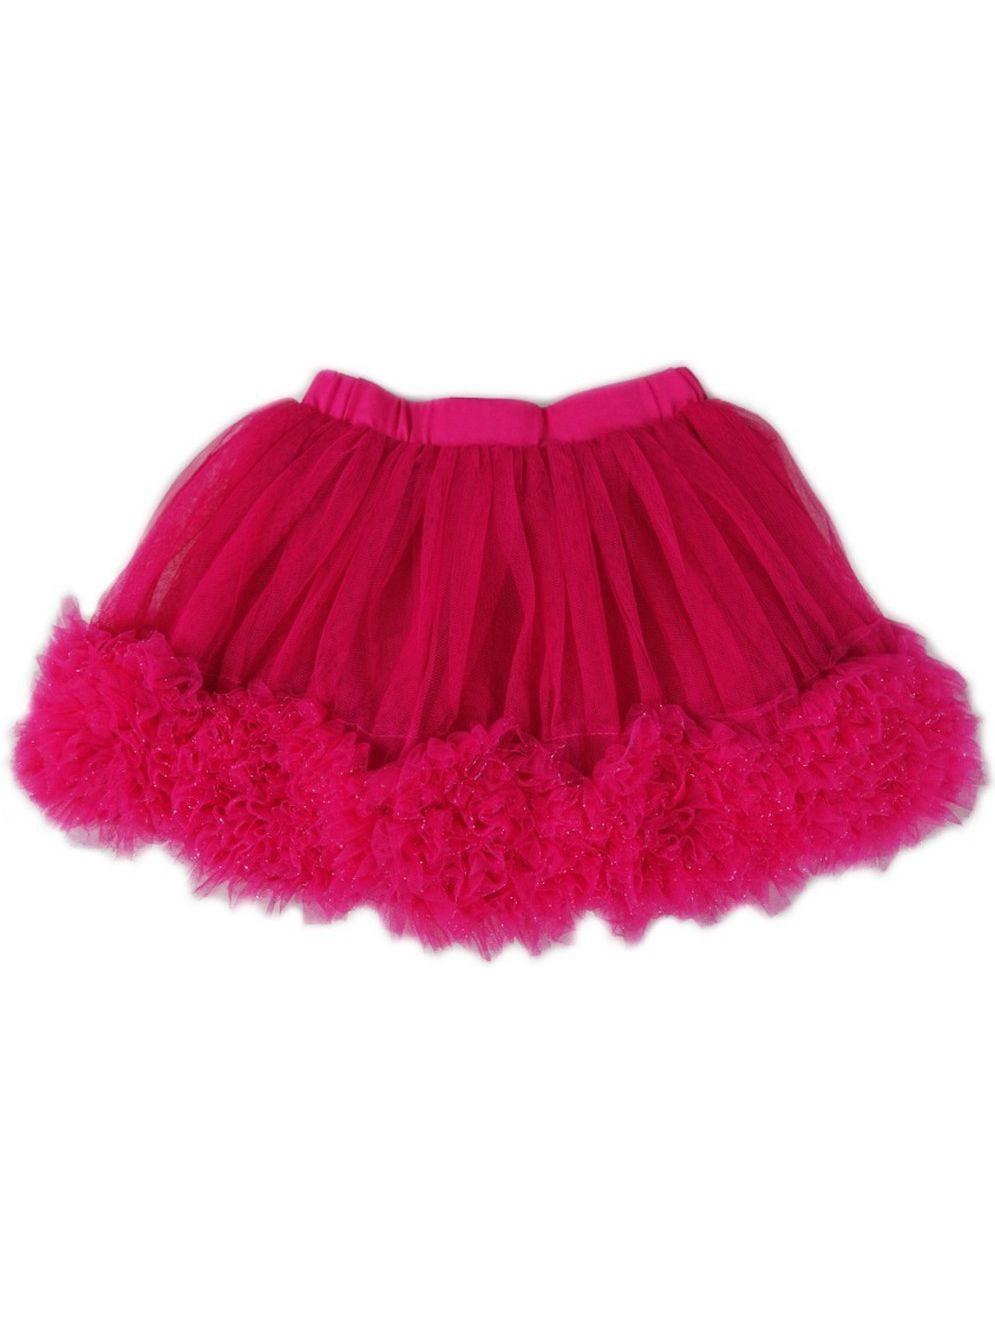 Wenchoice Girls Hot Pink 3-D Rose Trim Flouncy Tutu Skirt